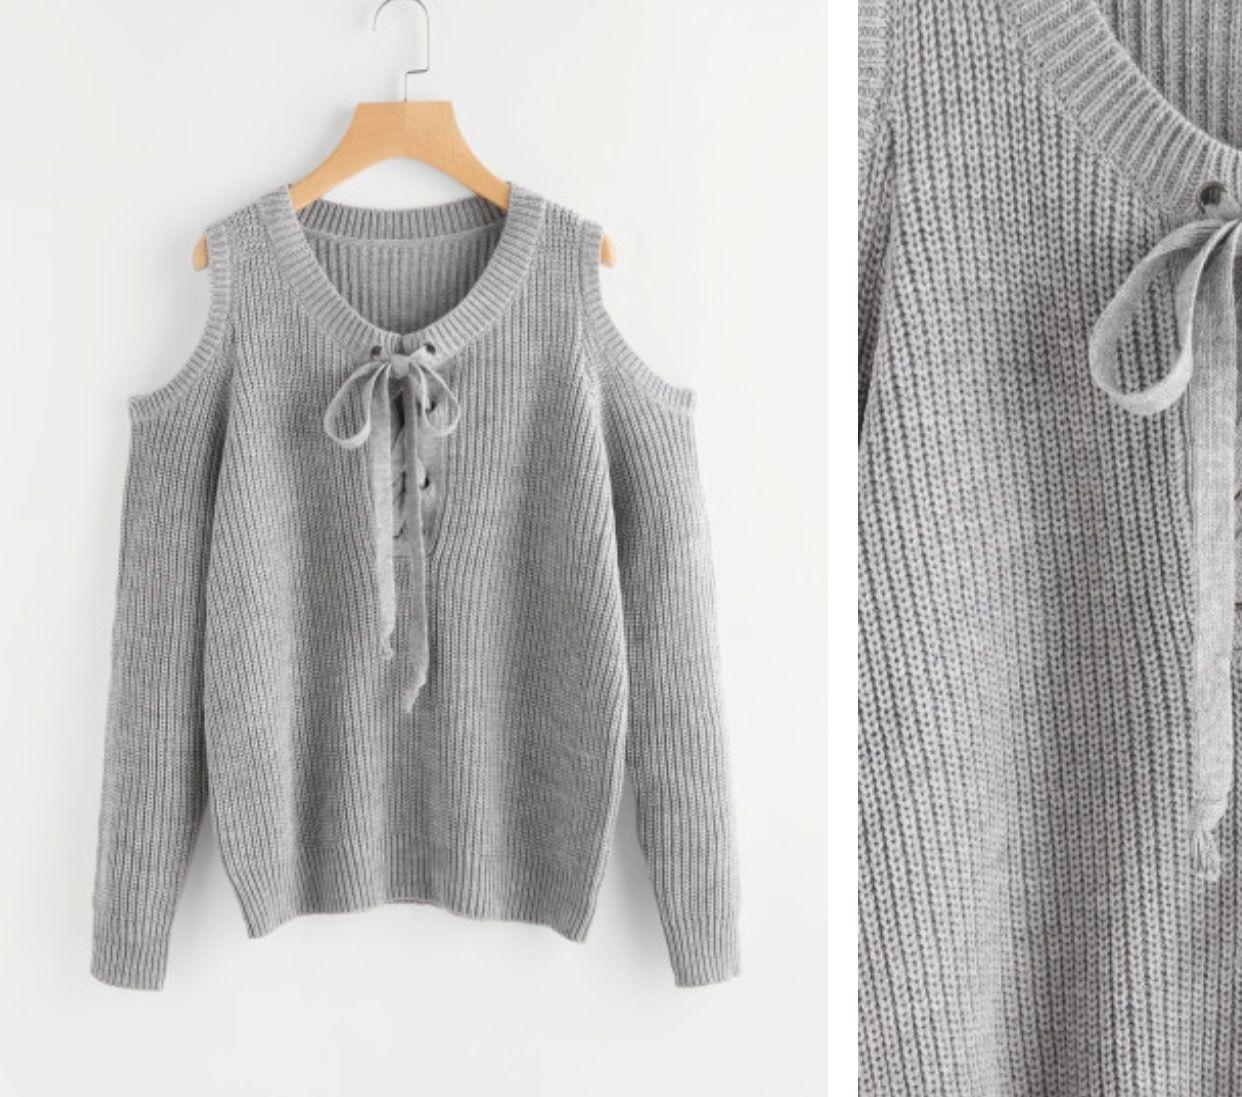 #style #fall #fallfashion #fashion #knitwear #happy #love #greyknitwear #knit #pullover #autumncolors #autumniscoming